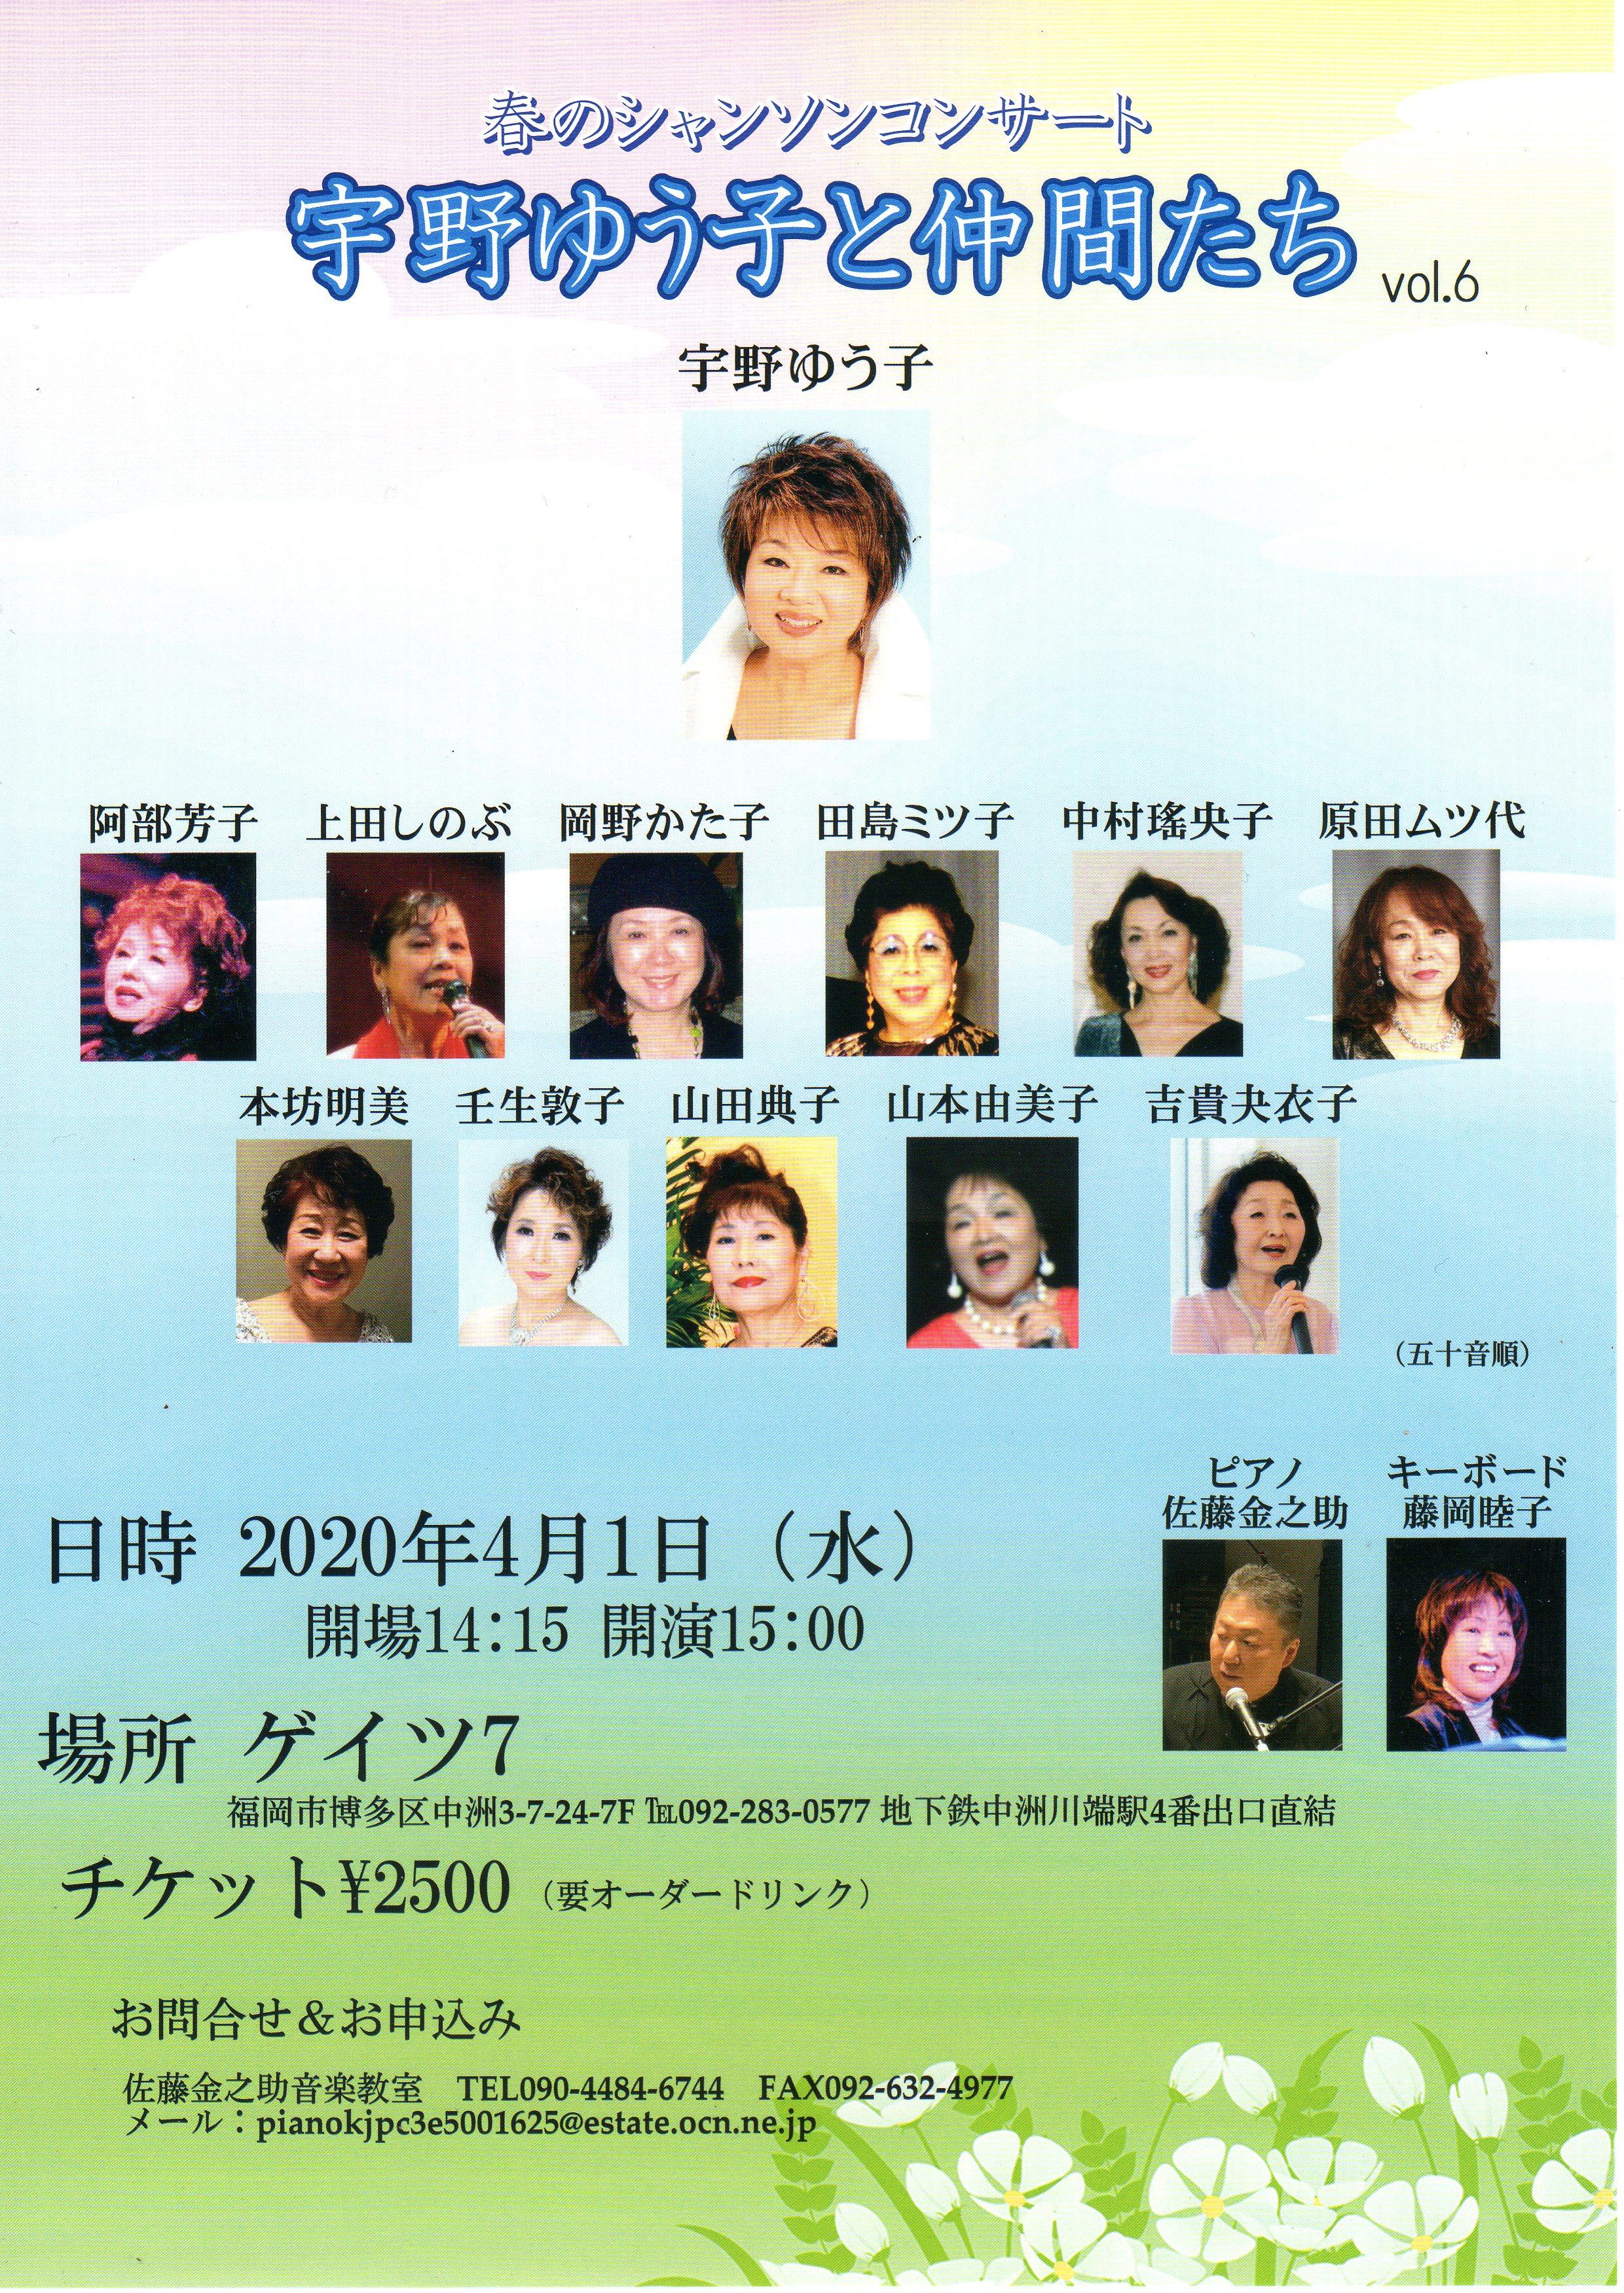 http://unoyuko.com/blog/chanson/f005.jpg